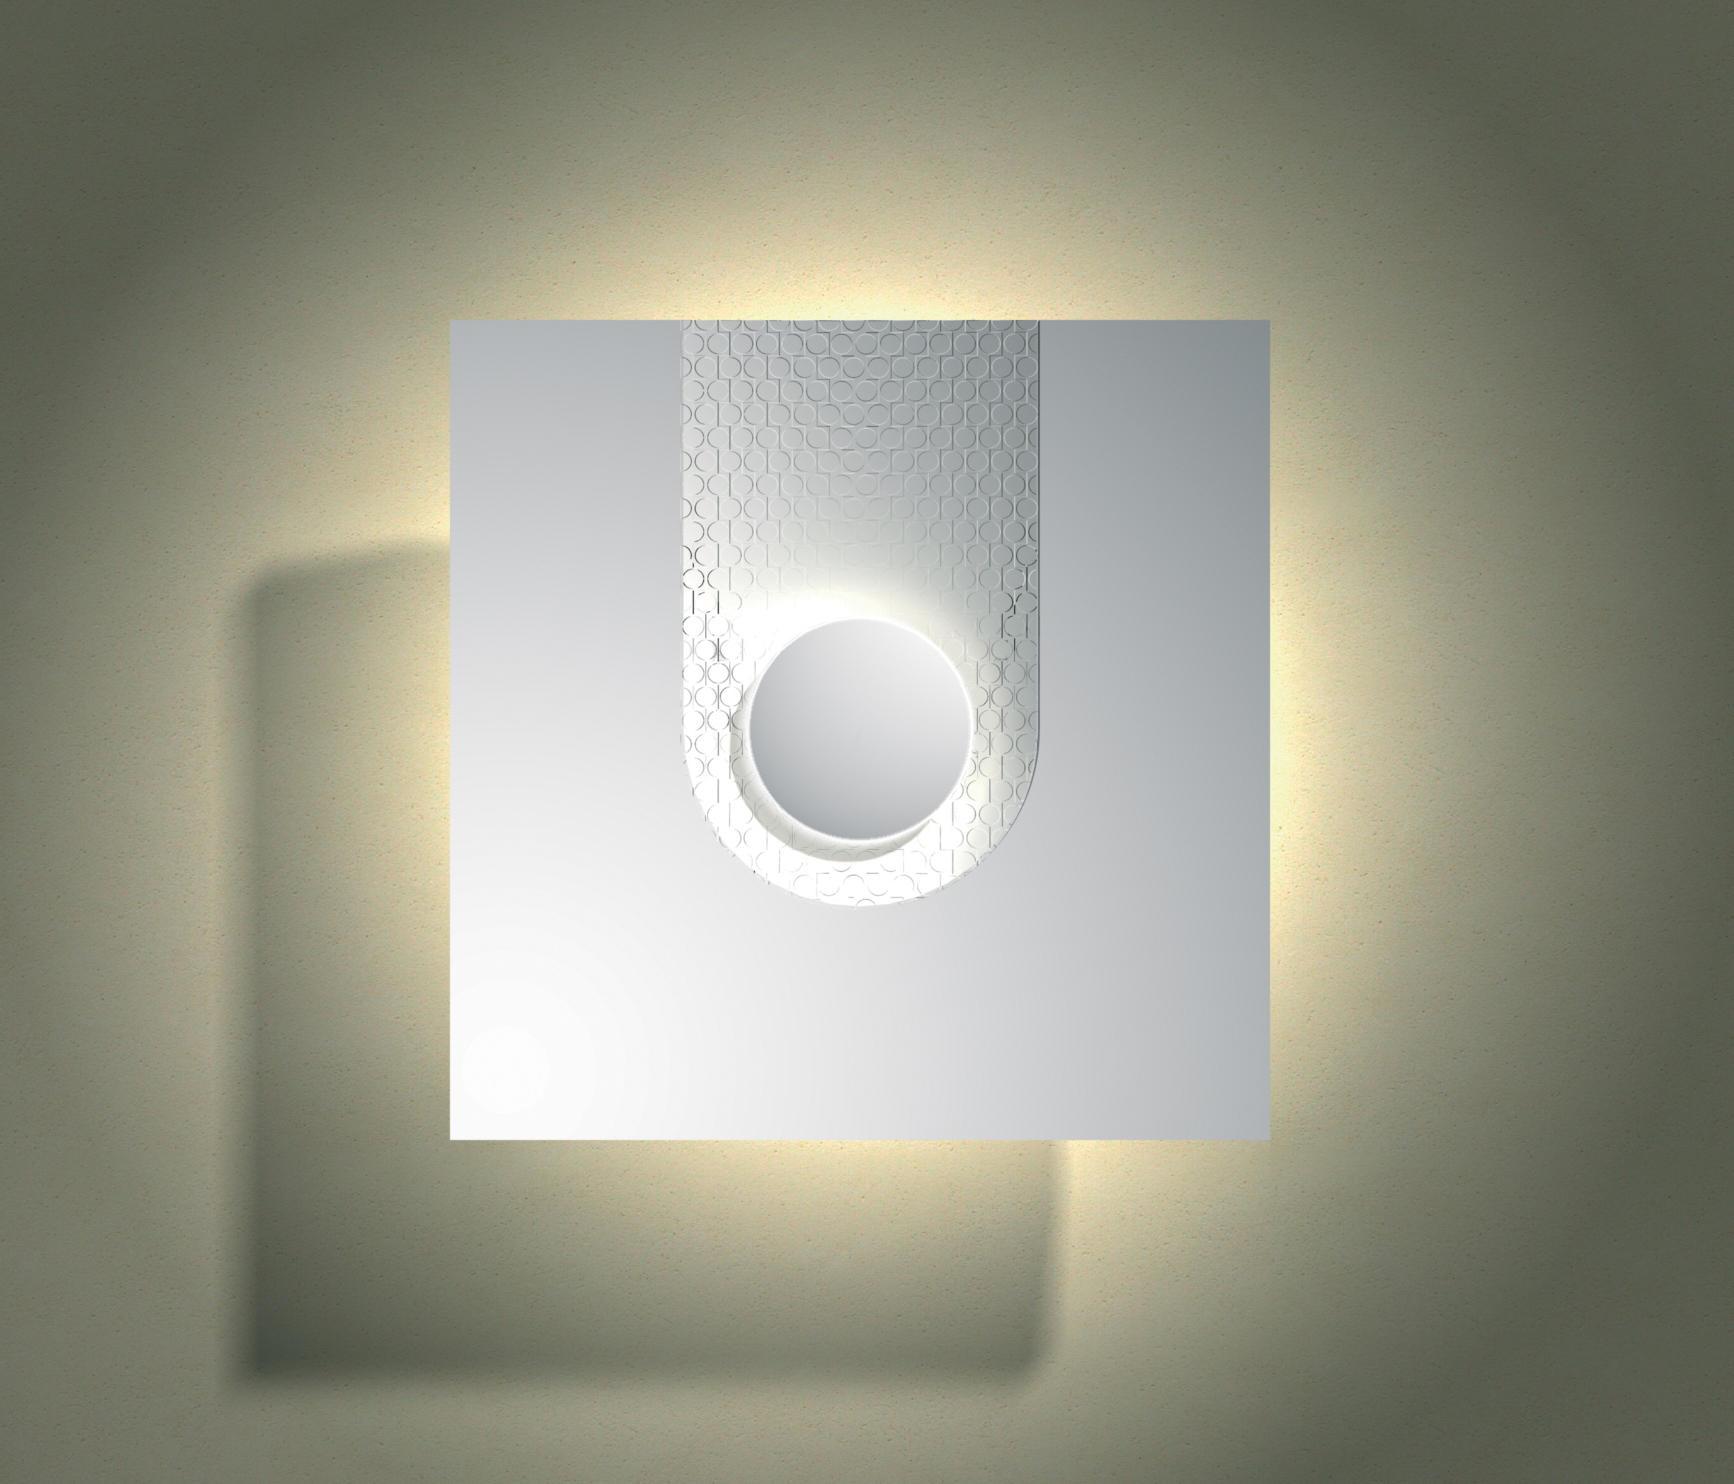 3027 wallpaper general lighting from atelier sedap. Black Bedroom Furniture Sets. Home Design Ideas